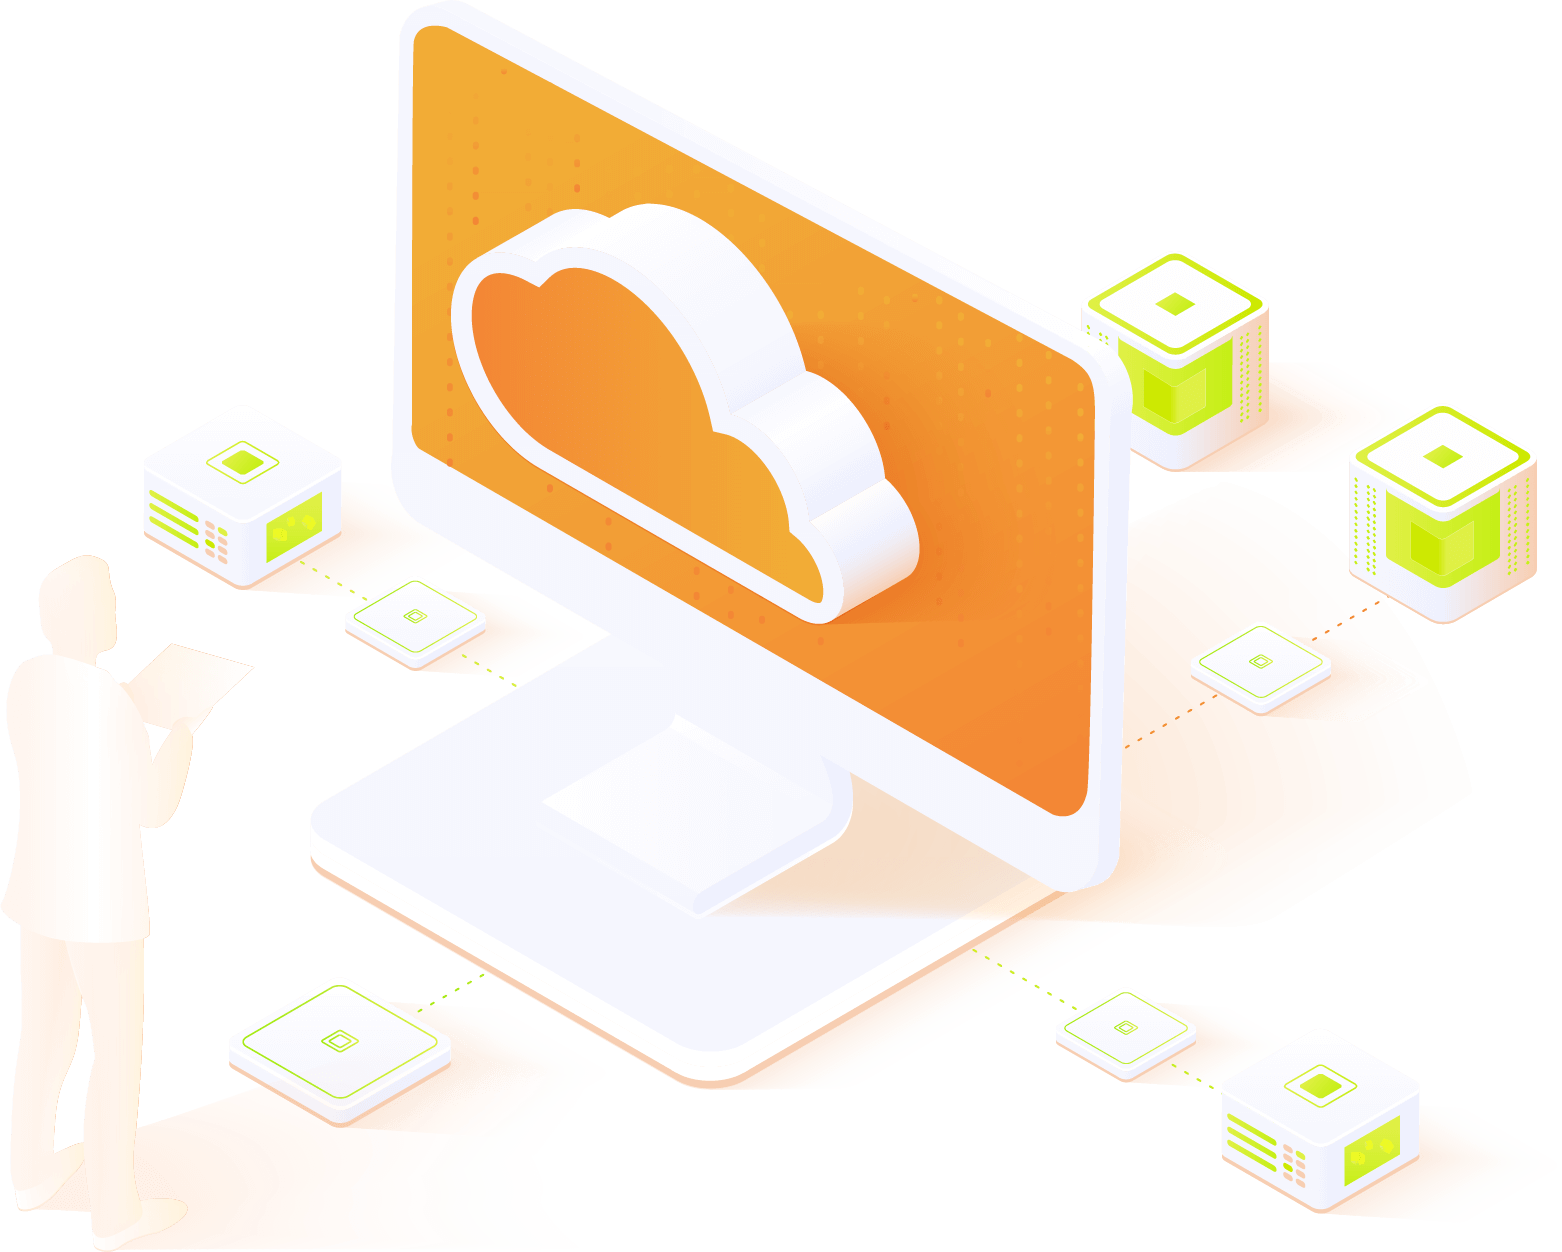 Image of cloud computing